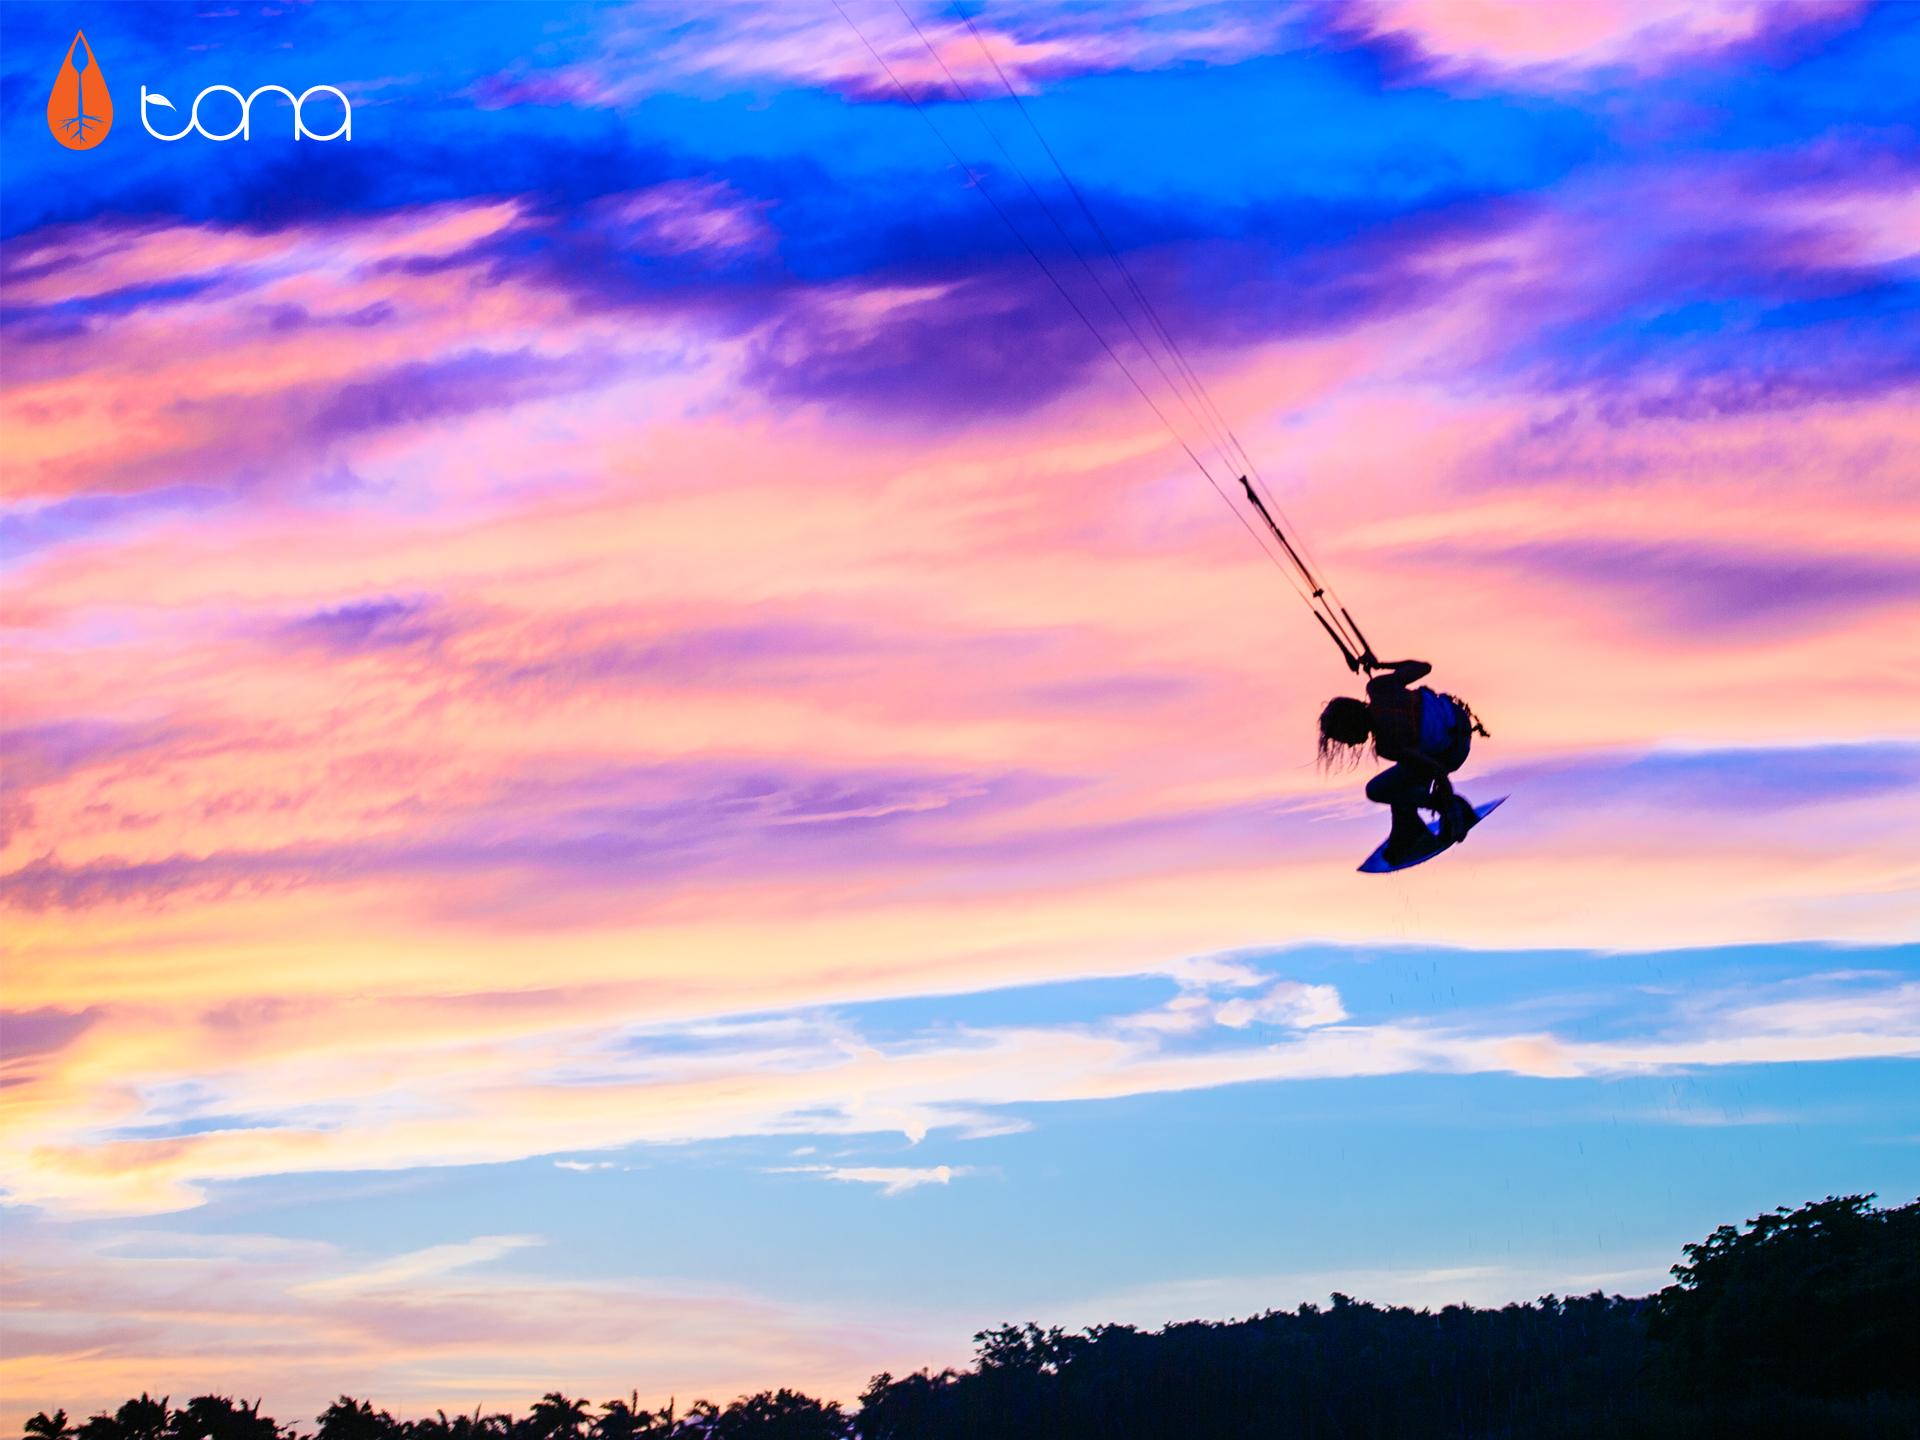 kitesurf wallpaper image - Indie grab at sunset with Tona Boards - kitesurfing - in resolution: Standard 4:3 1920 X 1440